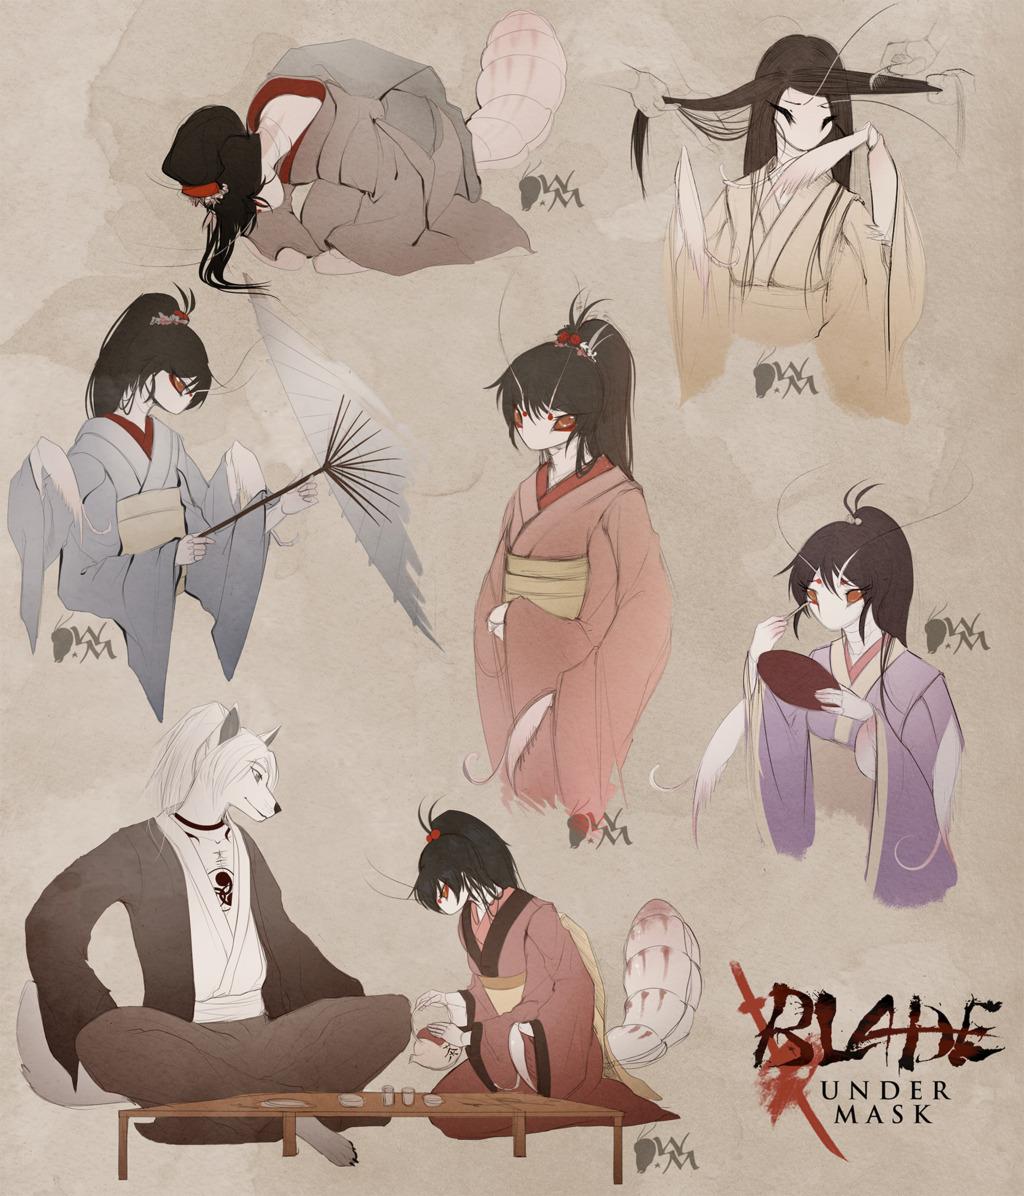 Blade Under Mask: Everyday Life